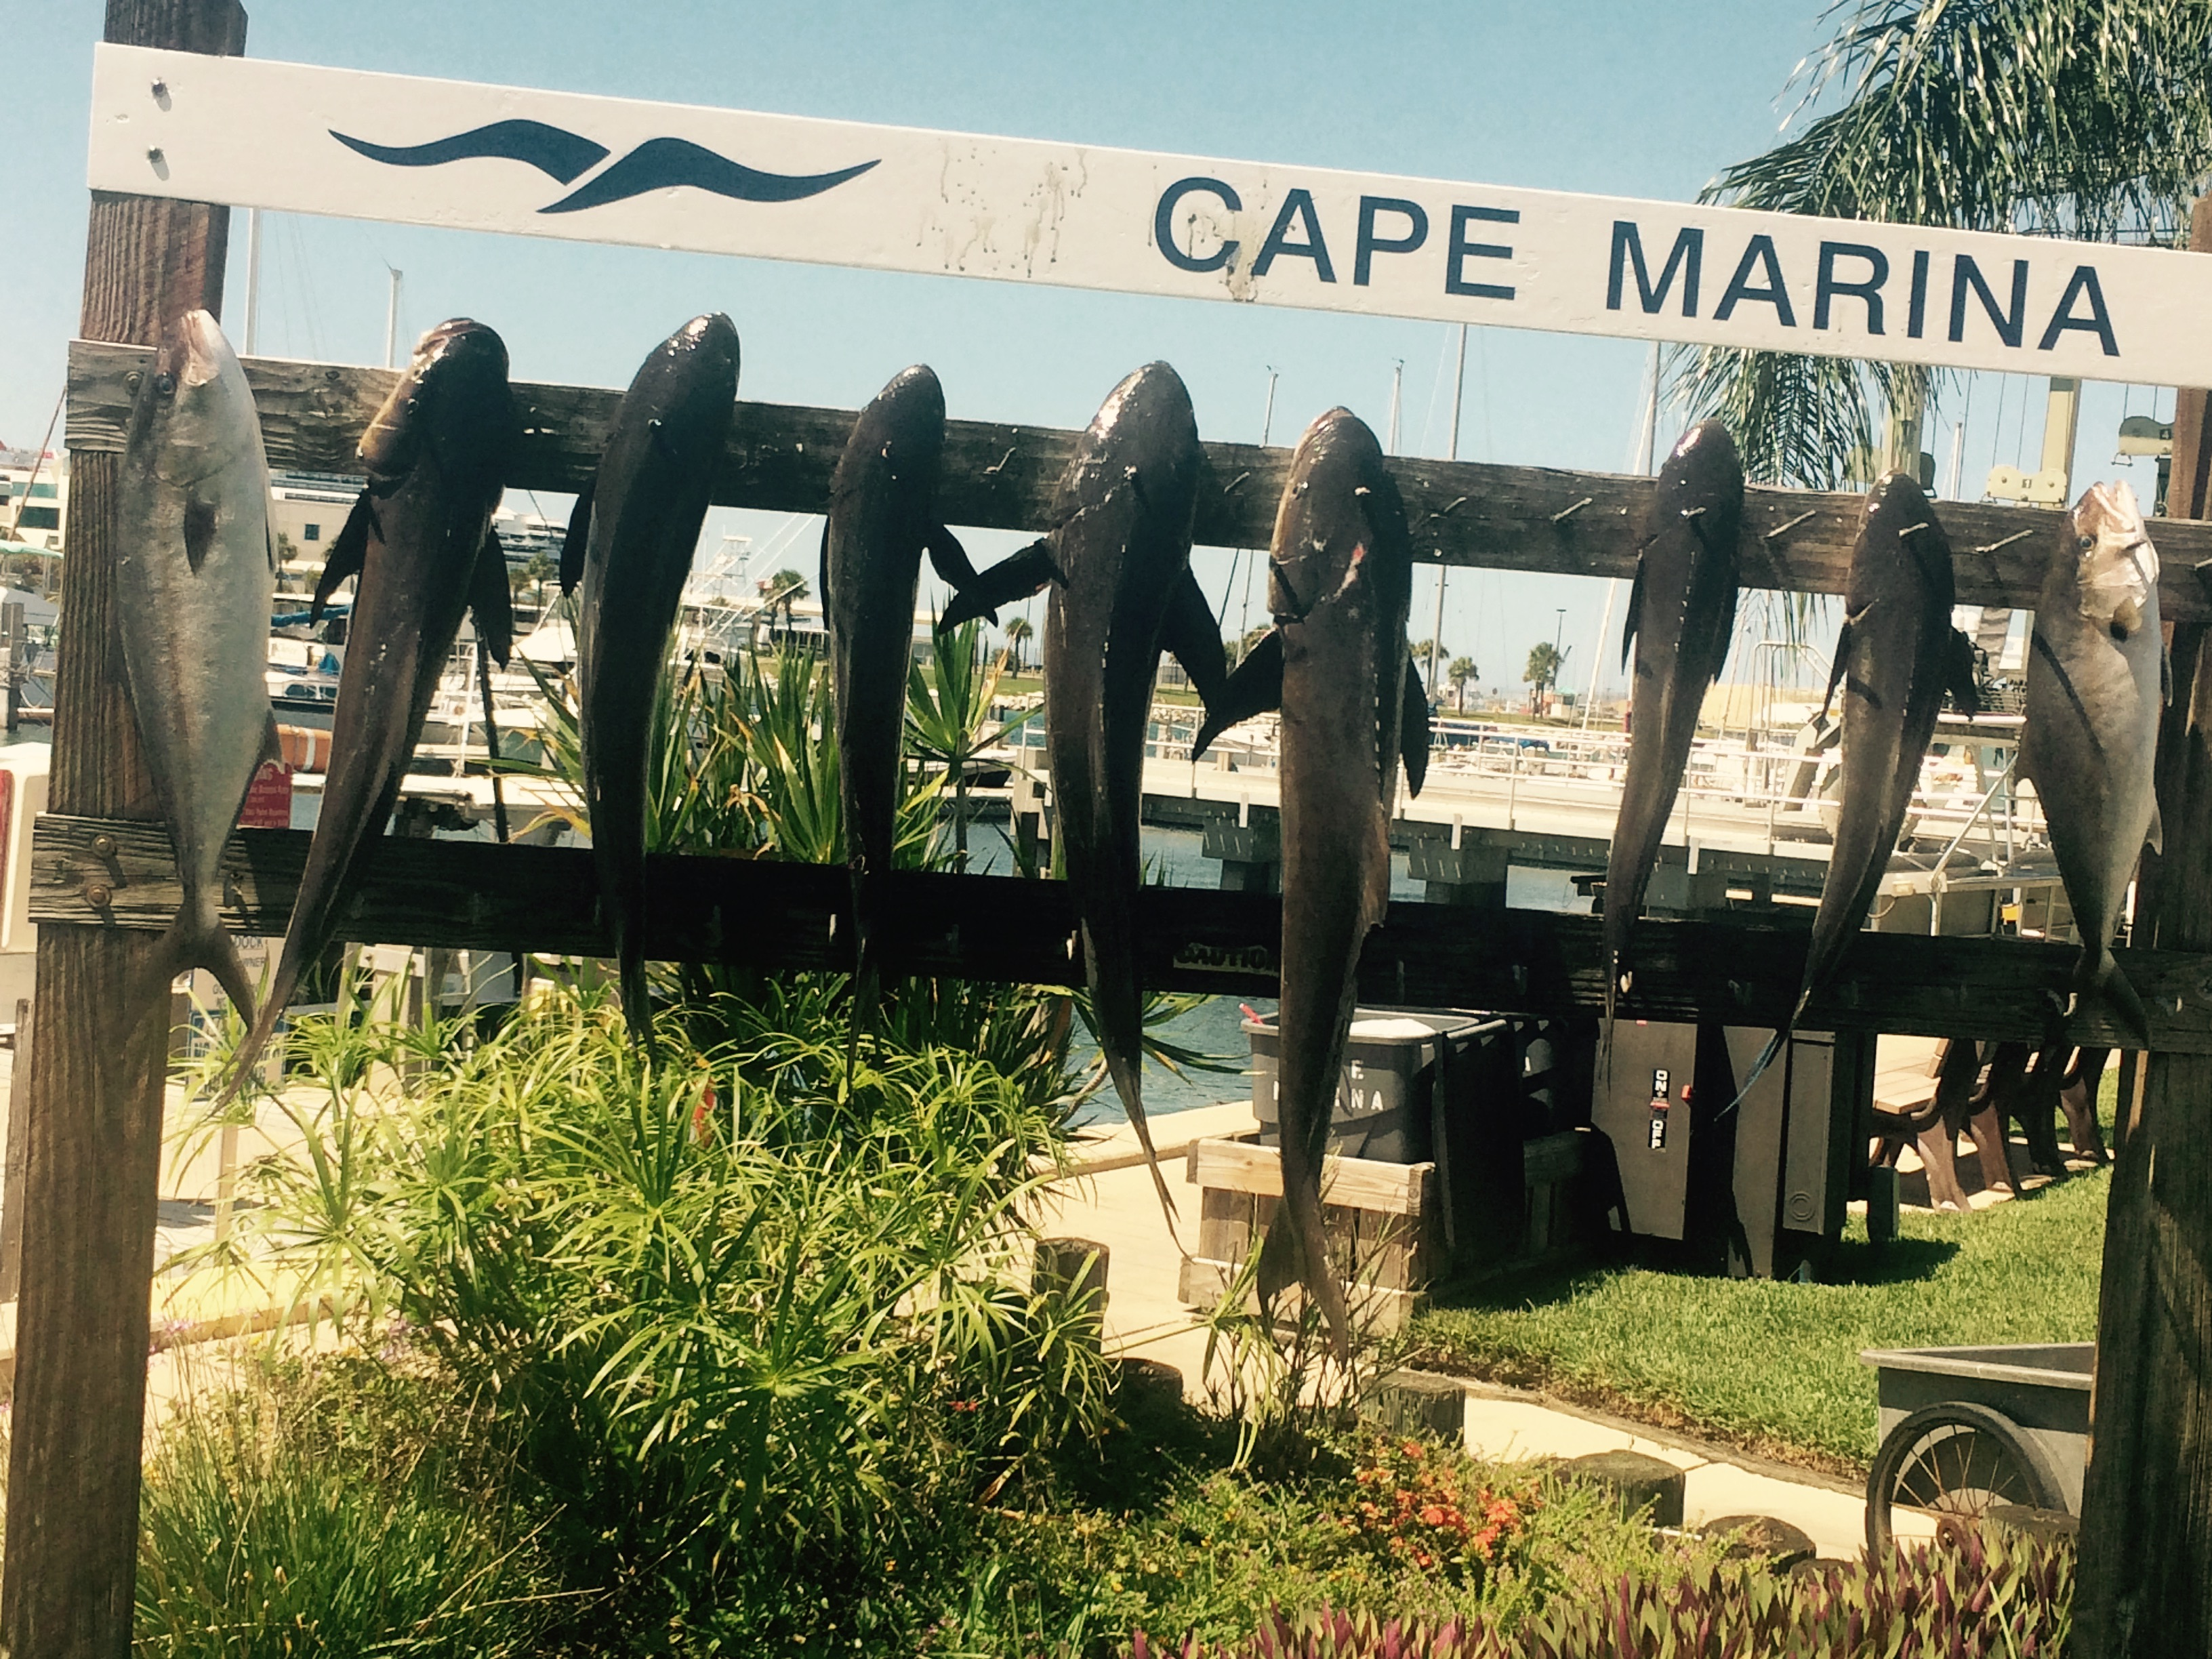 Ofishal Business Fishing Charters